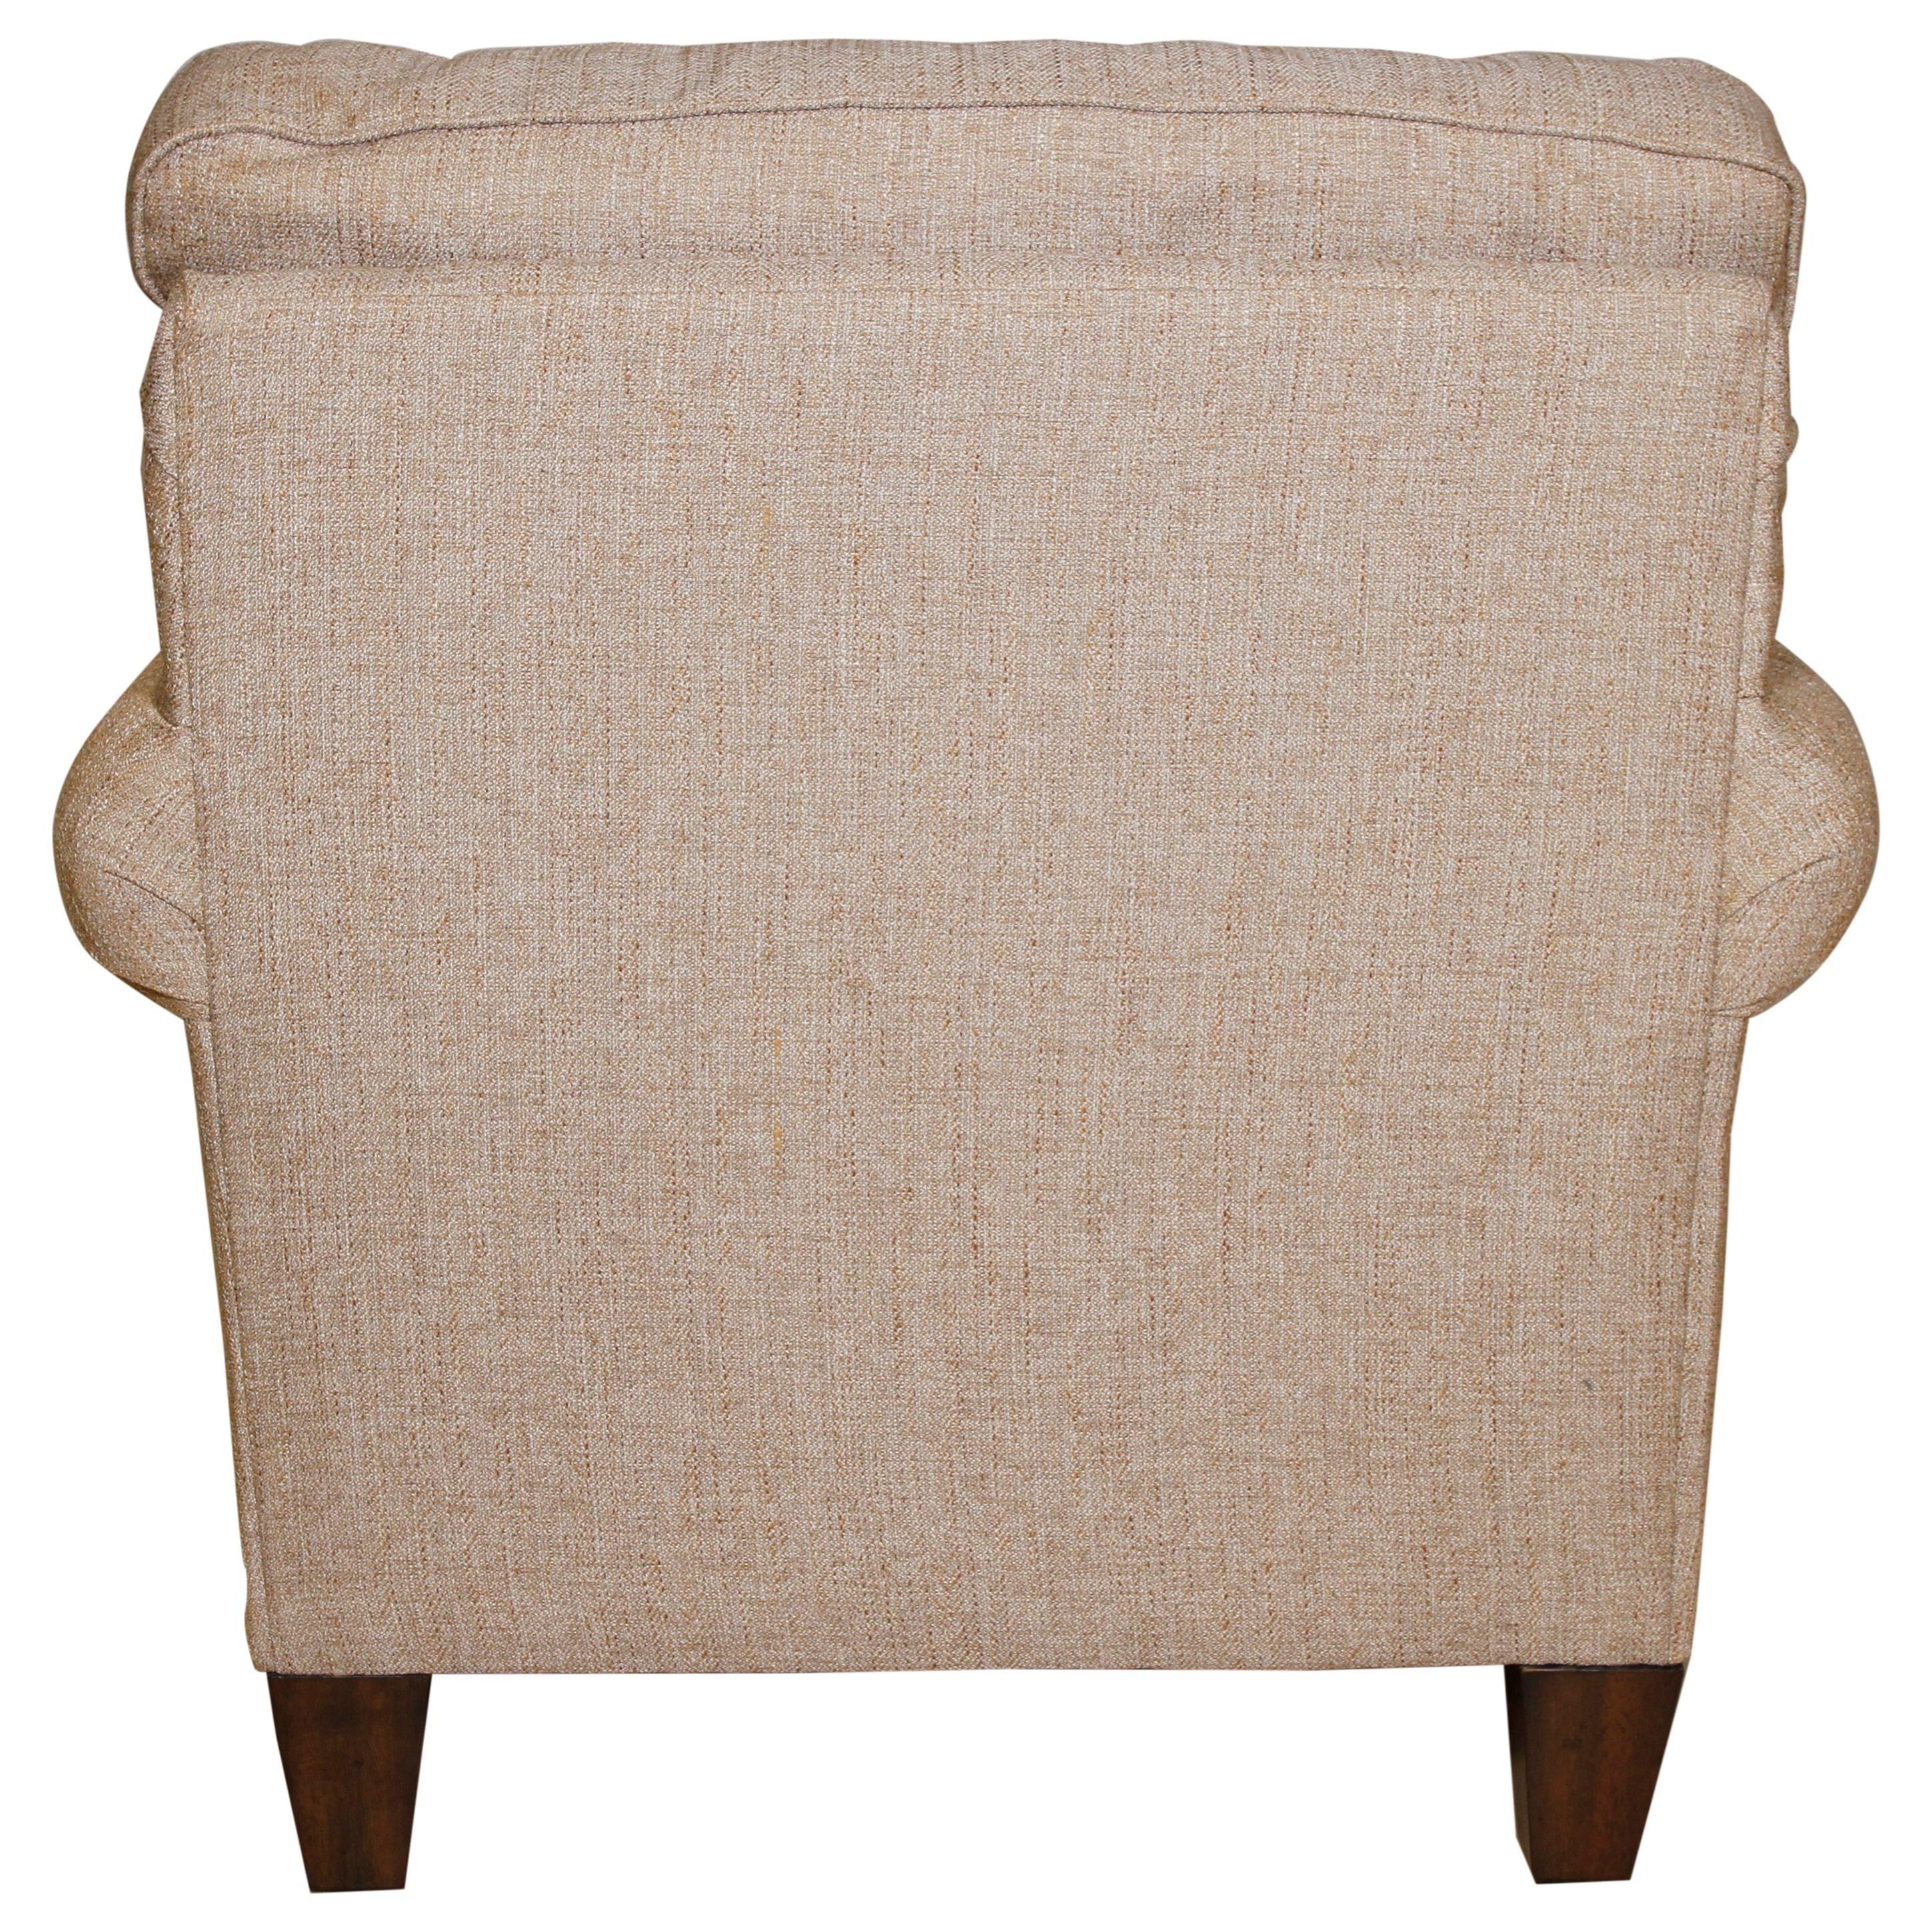 Flexsteel Westside Sofa Reviews: Flexsteel Westside Casual Style Rolled Arm Chair